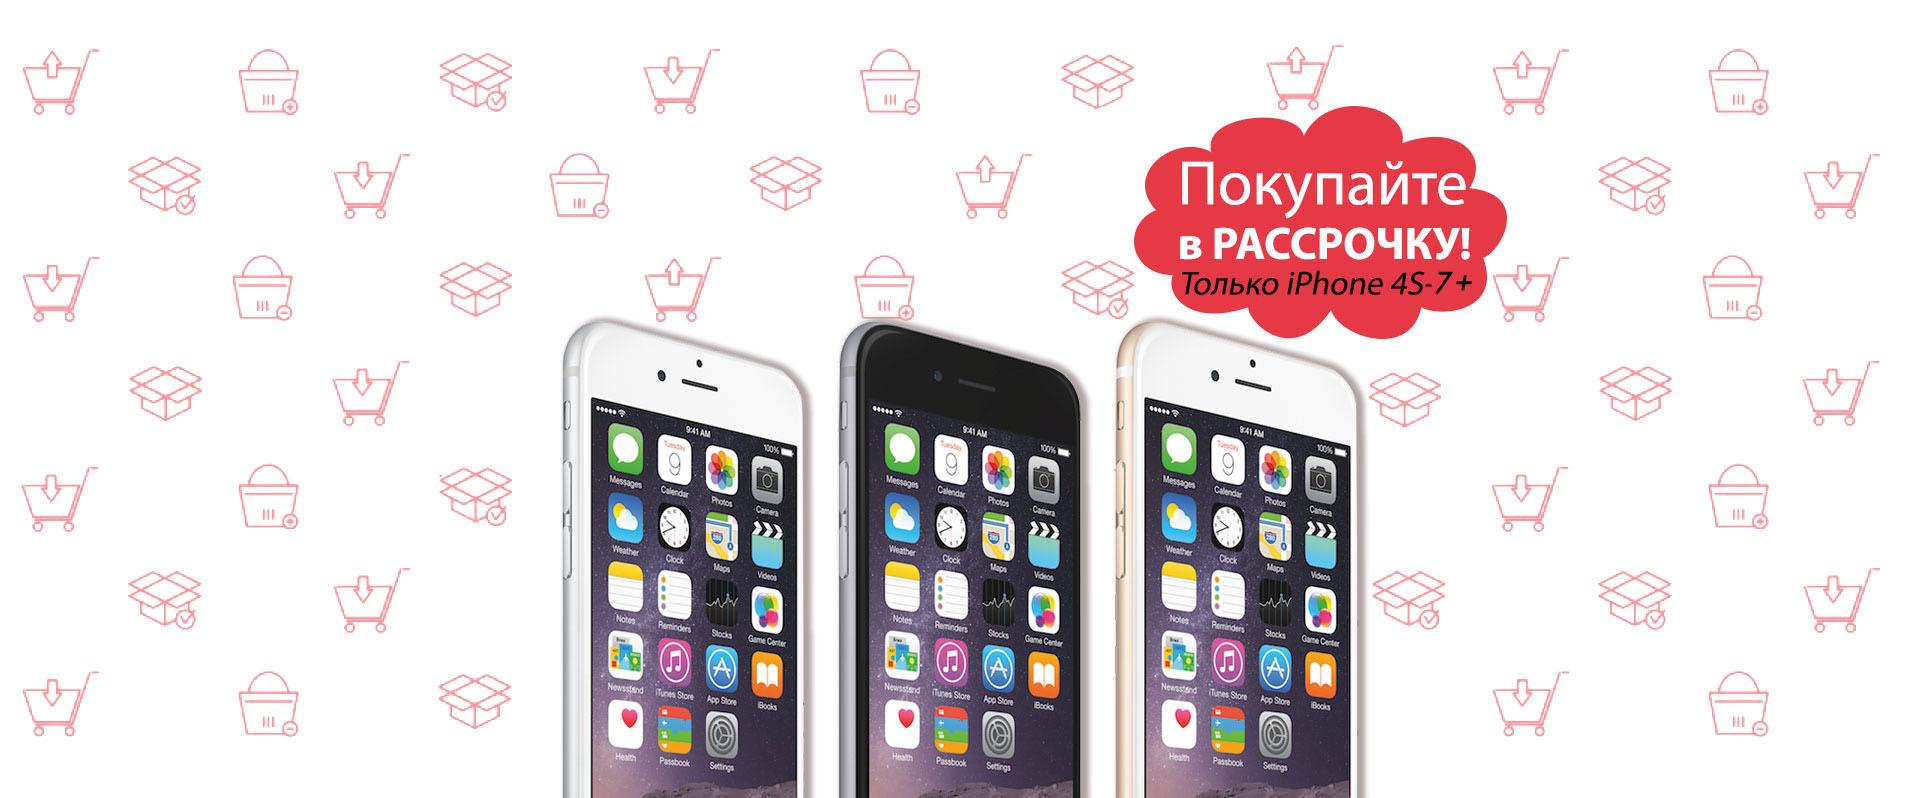 banner-dlja-sajta-krasnyj-iphone8-vosstanovleno32